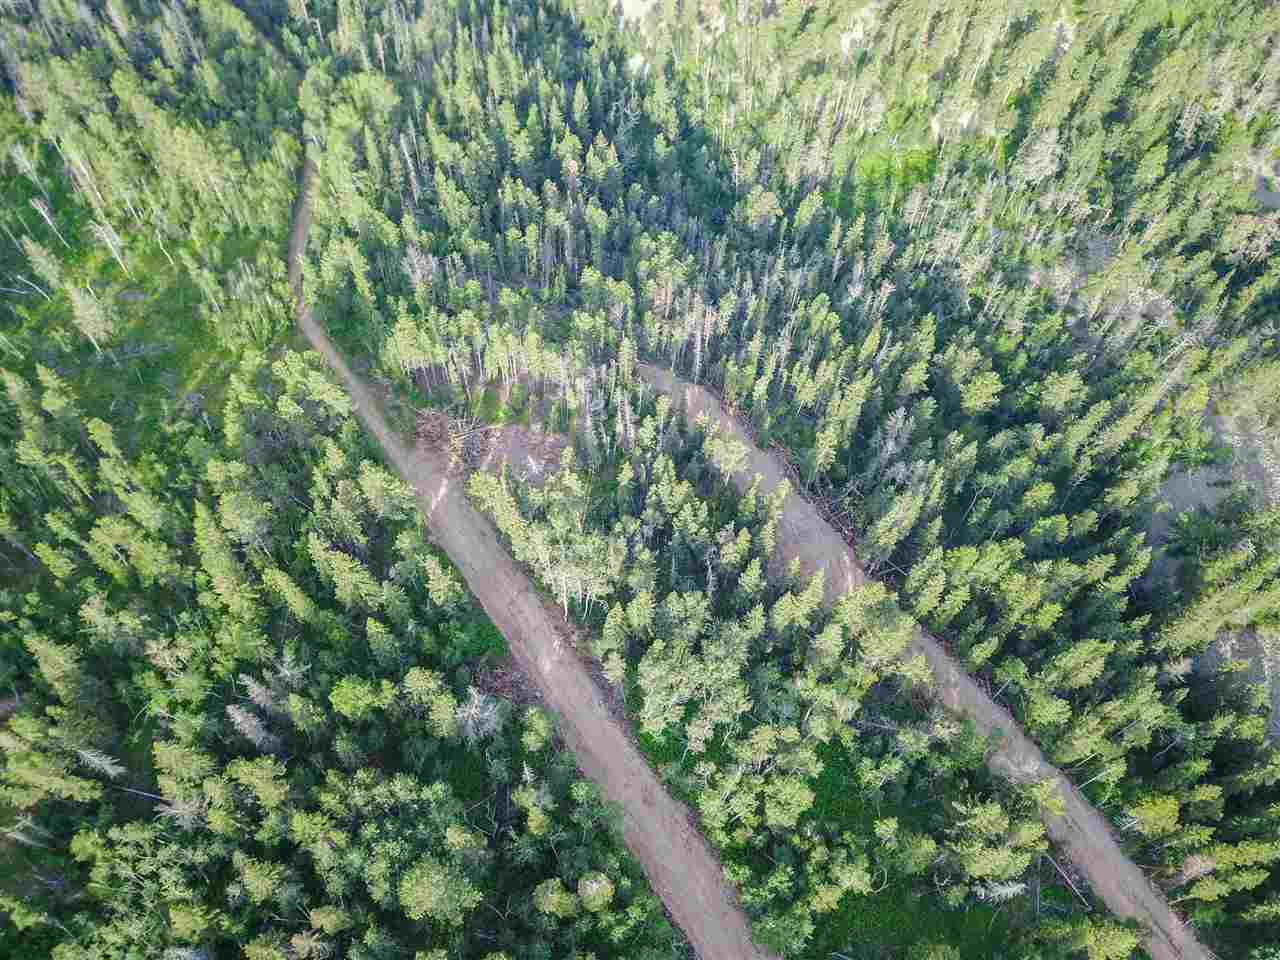 TBD 25 Lost Camp Trail